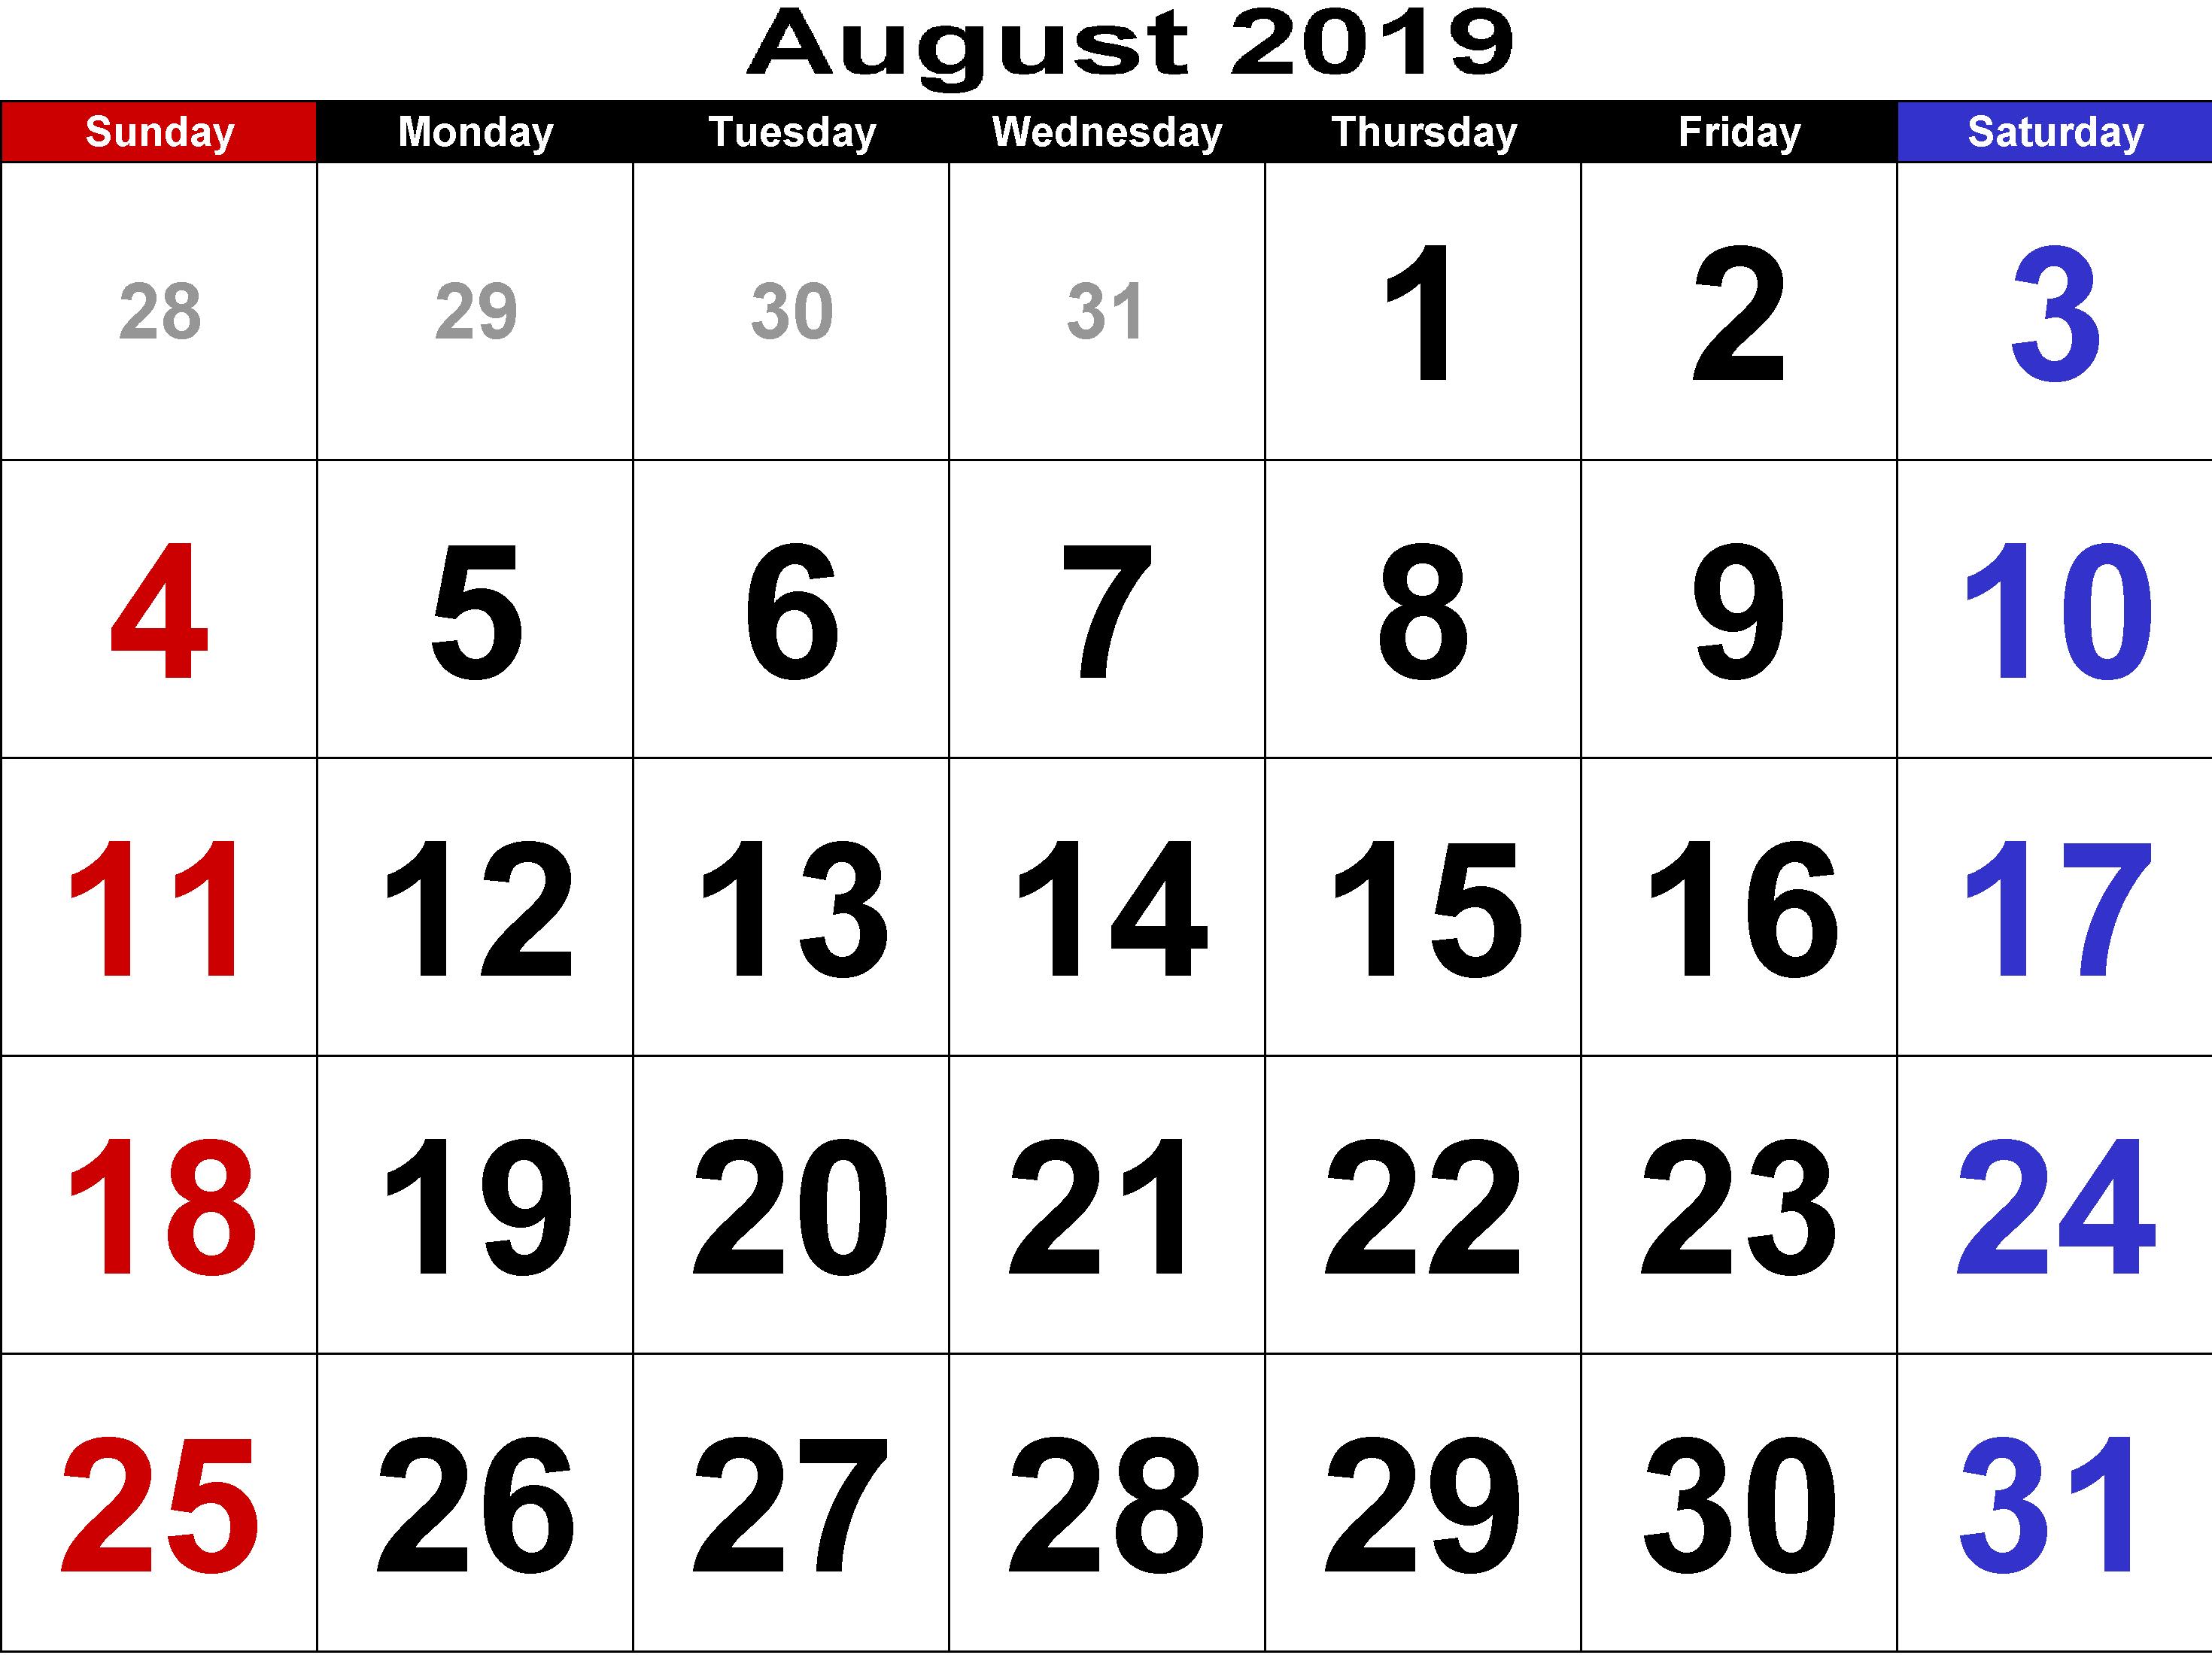 Agusut - December 2017 And 2019 Monthly Calendar Printable Free Printable August 2019 Calendar With Holidays #decorative